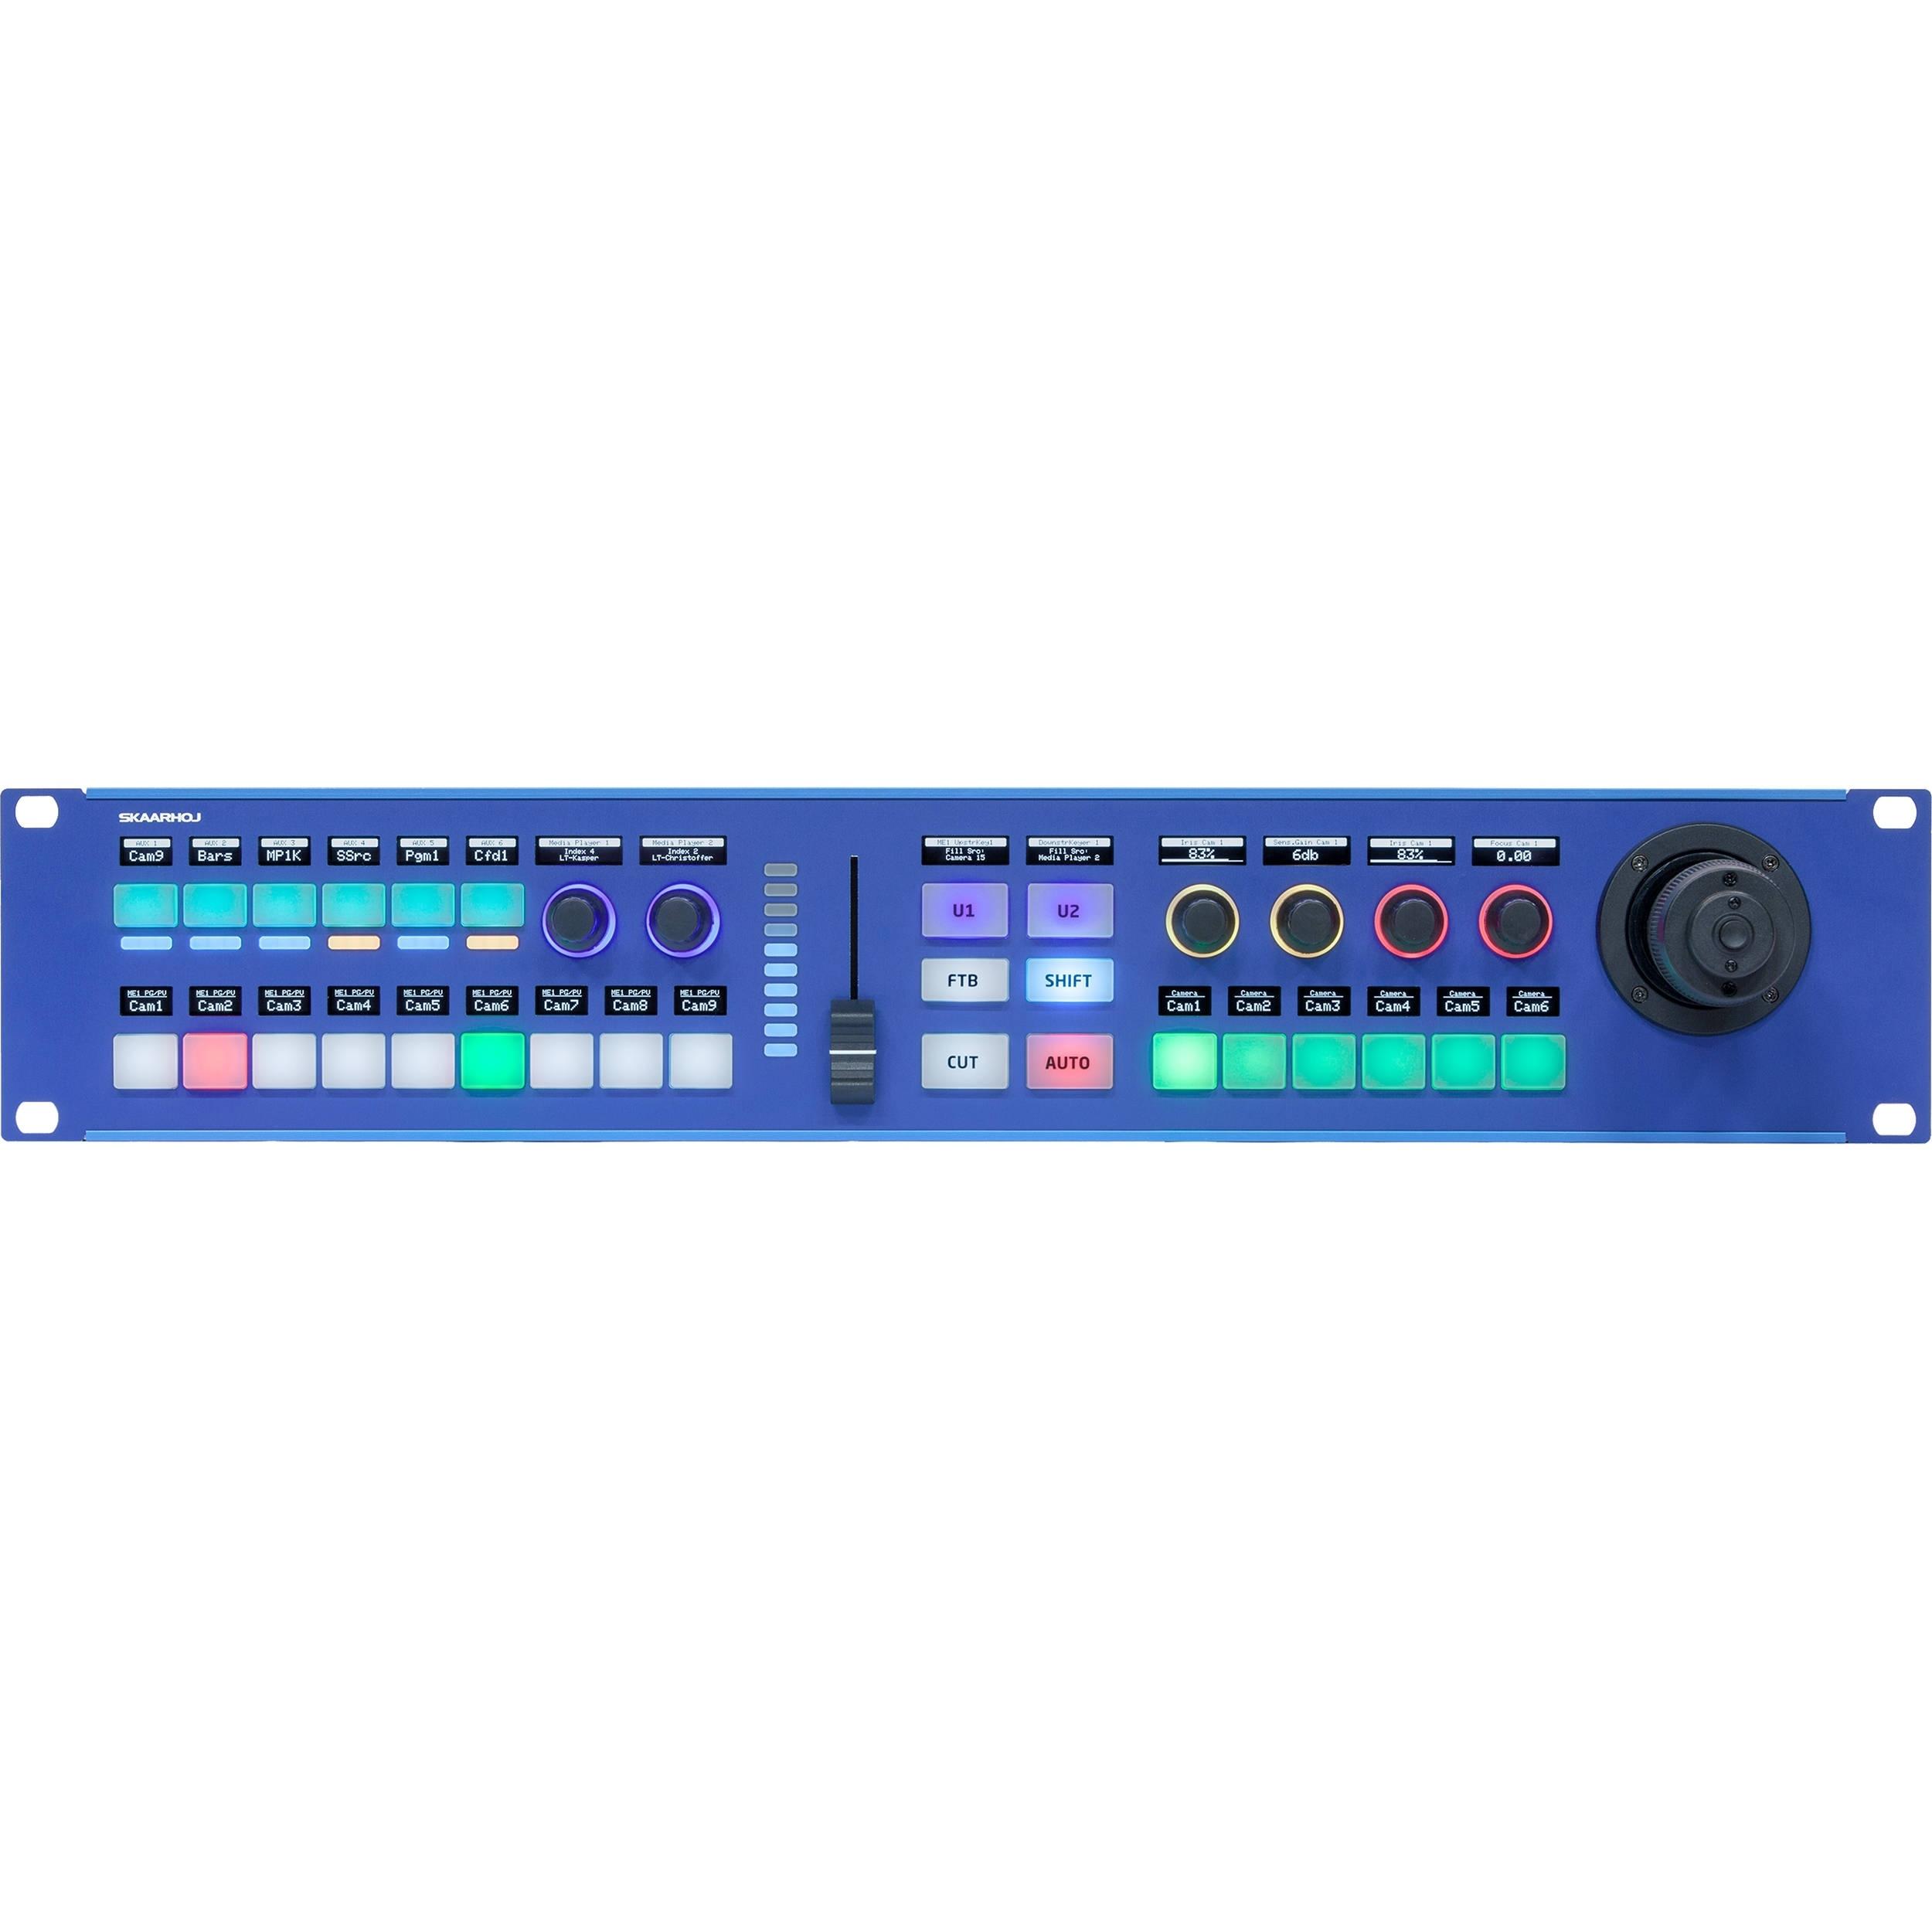 SKAARHOJ Rack Fusion Live PTZ Controller (2 RU)